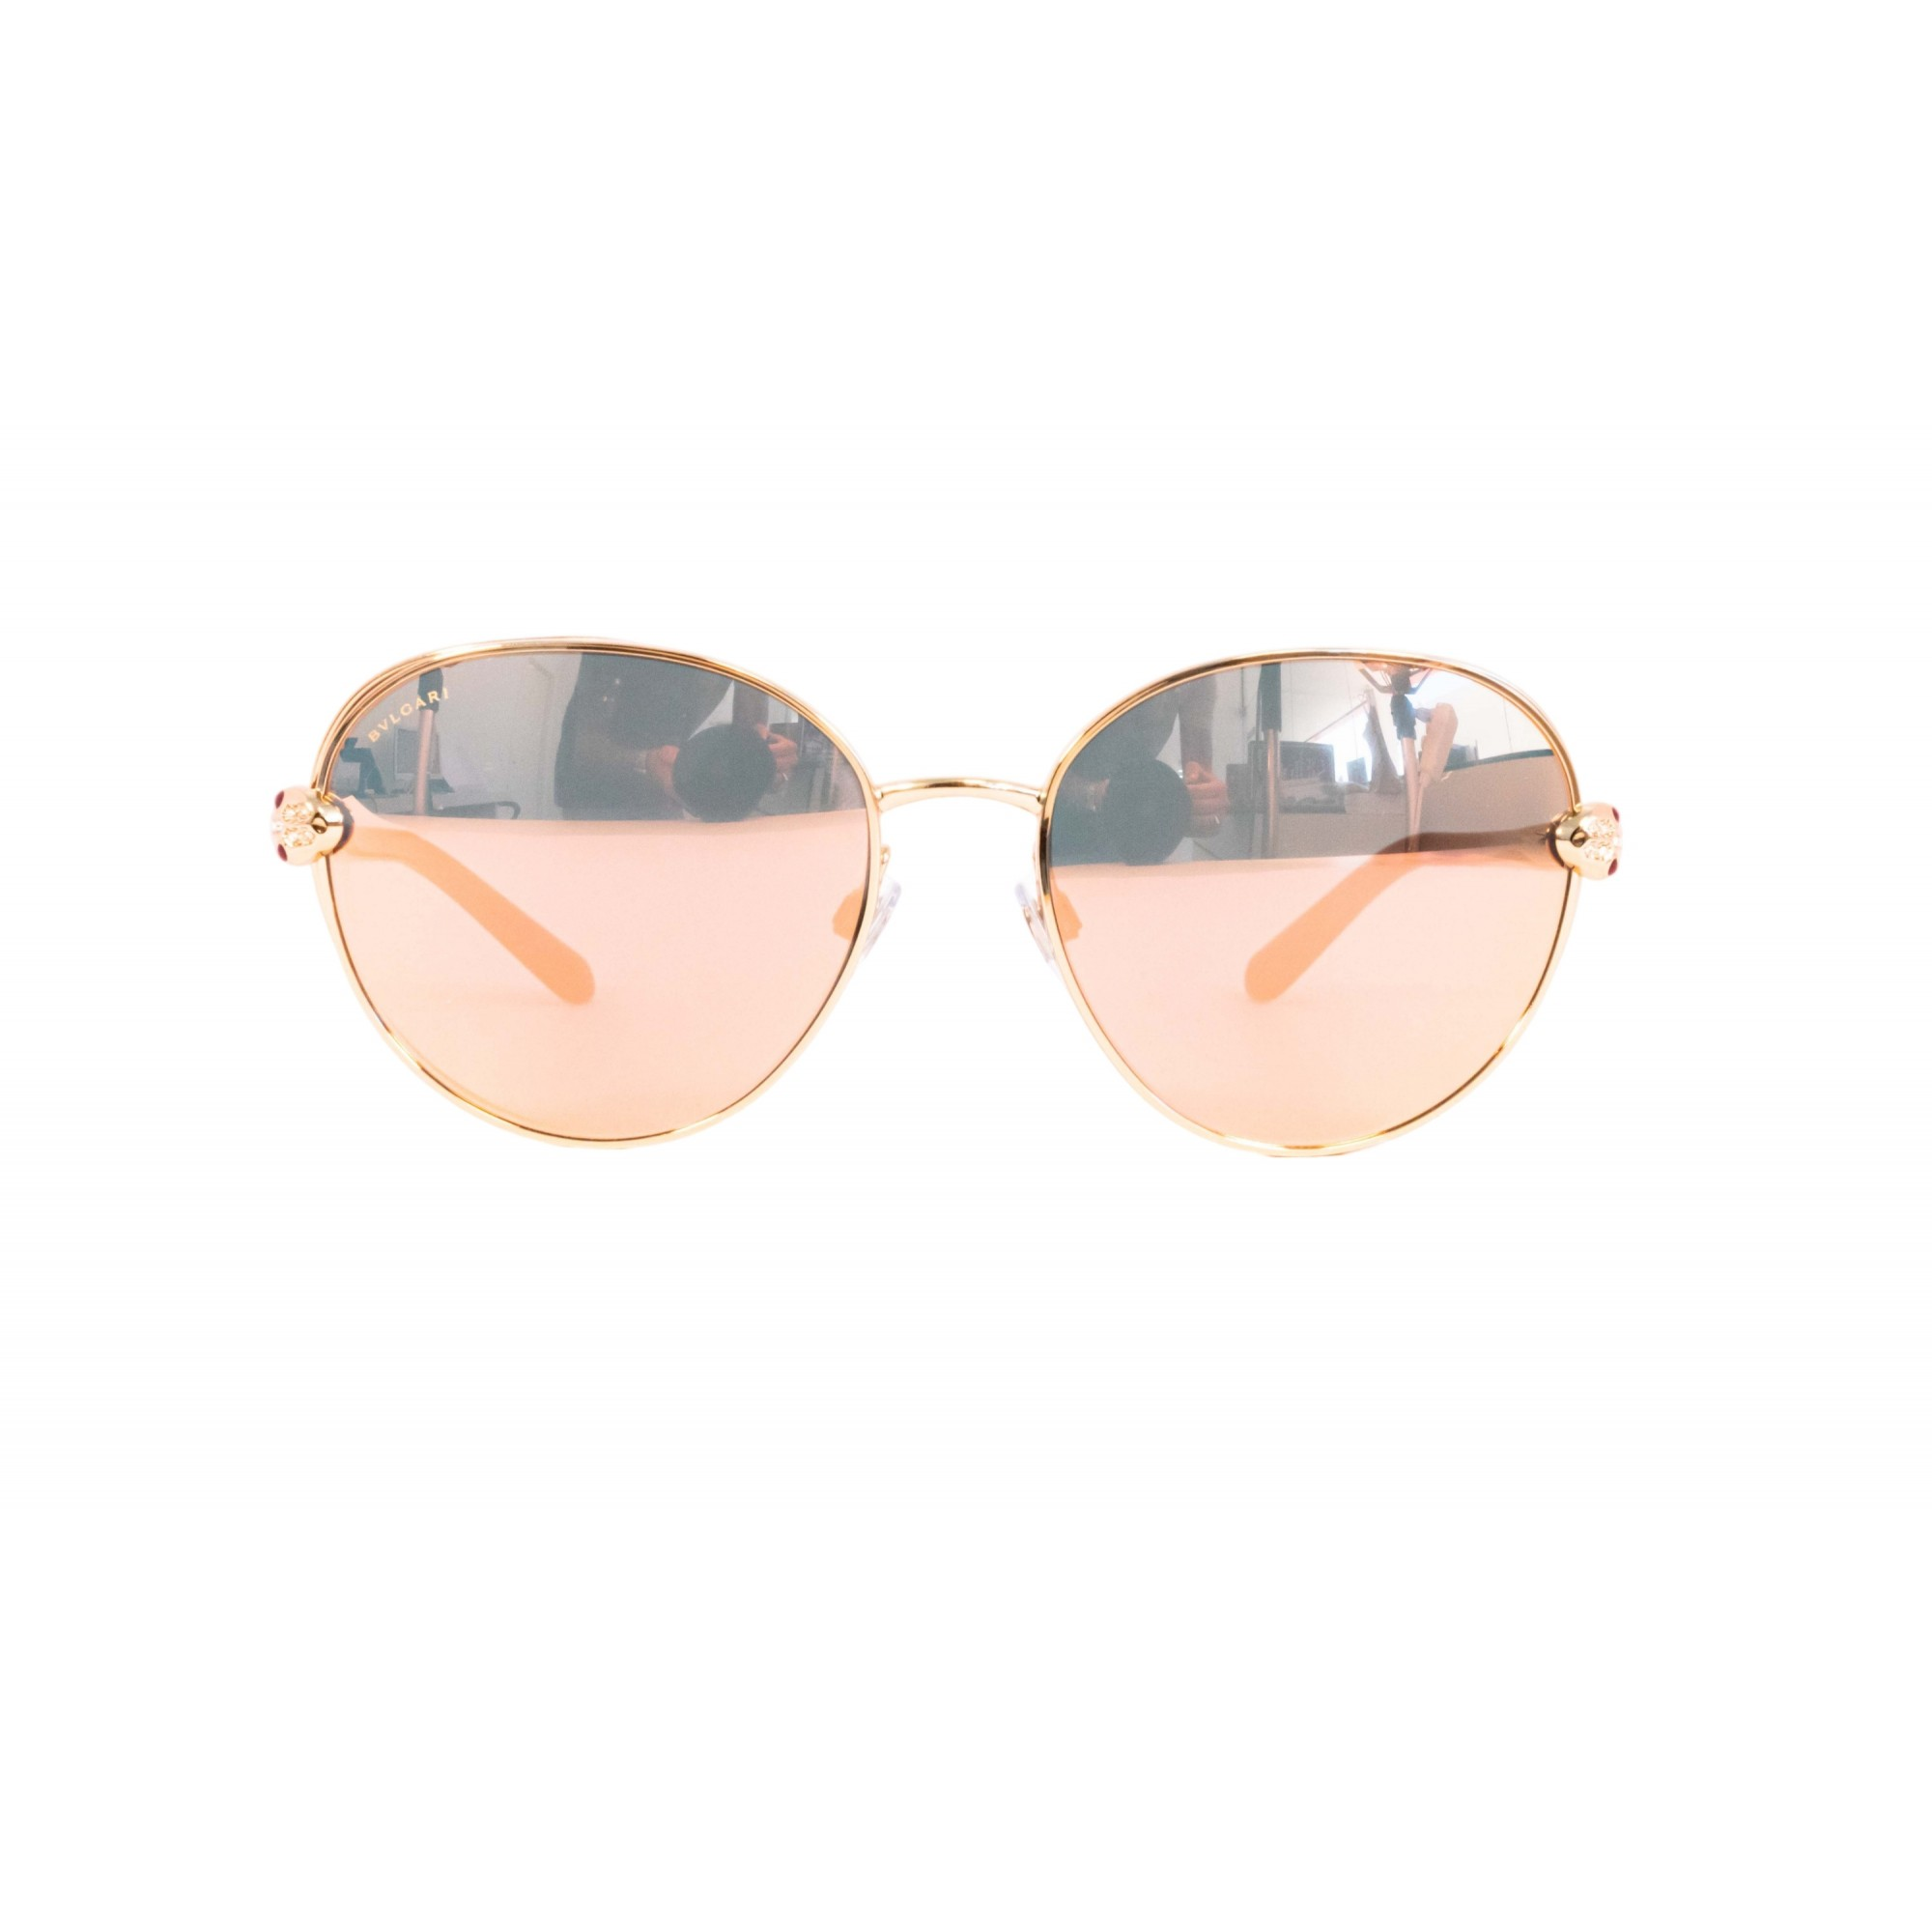 Óculos Bvlgari Clássico bv6087b 20144z 57 Dourado